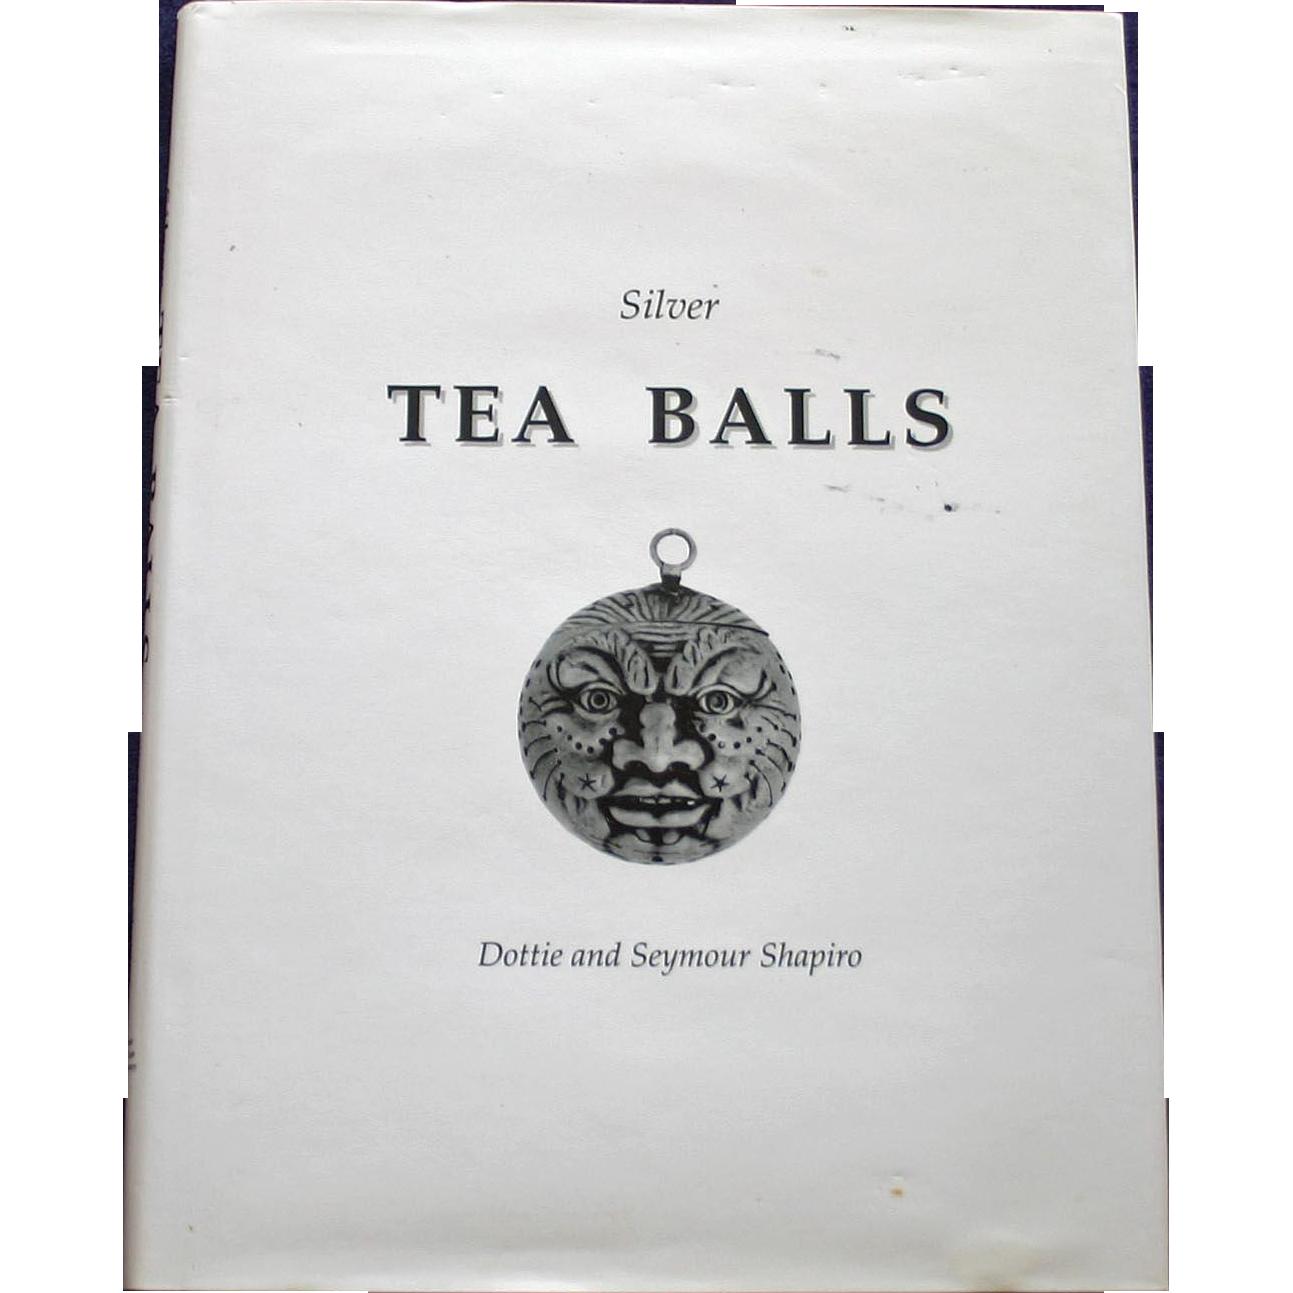 Item ID: silverteaballs In Shop Backroom